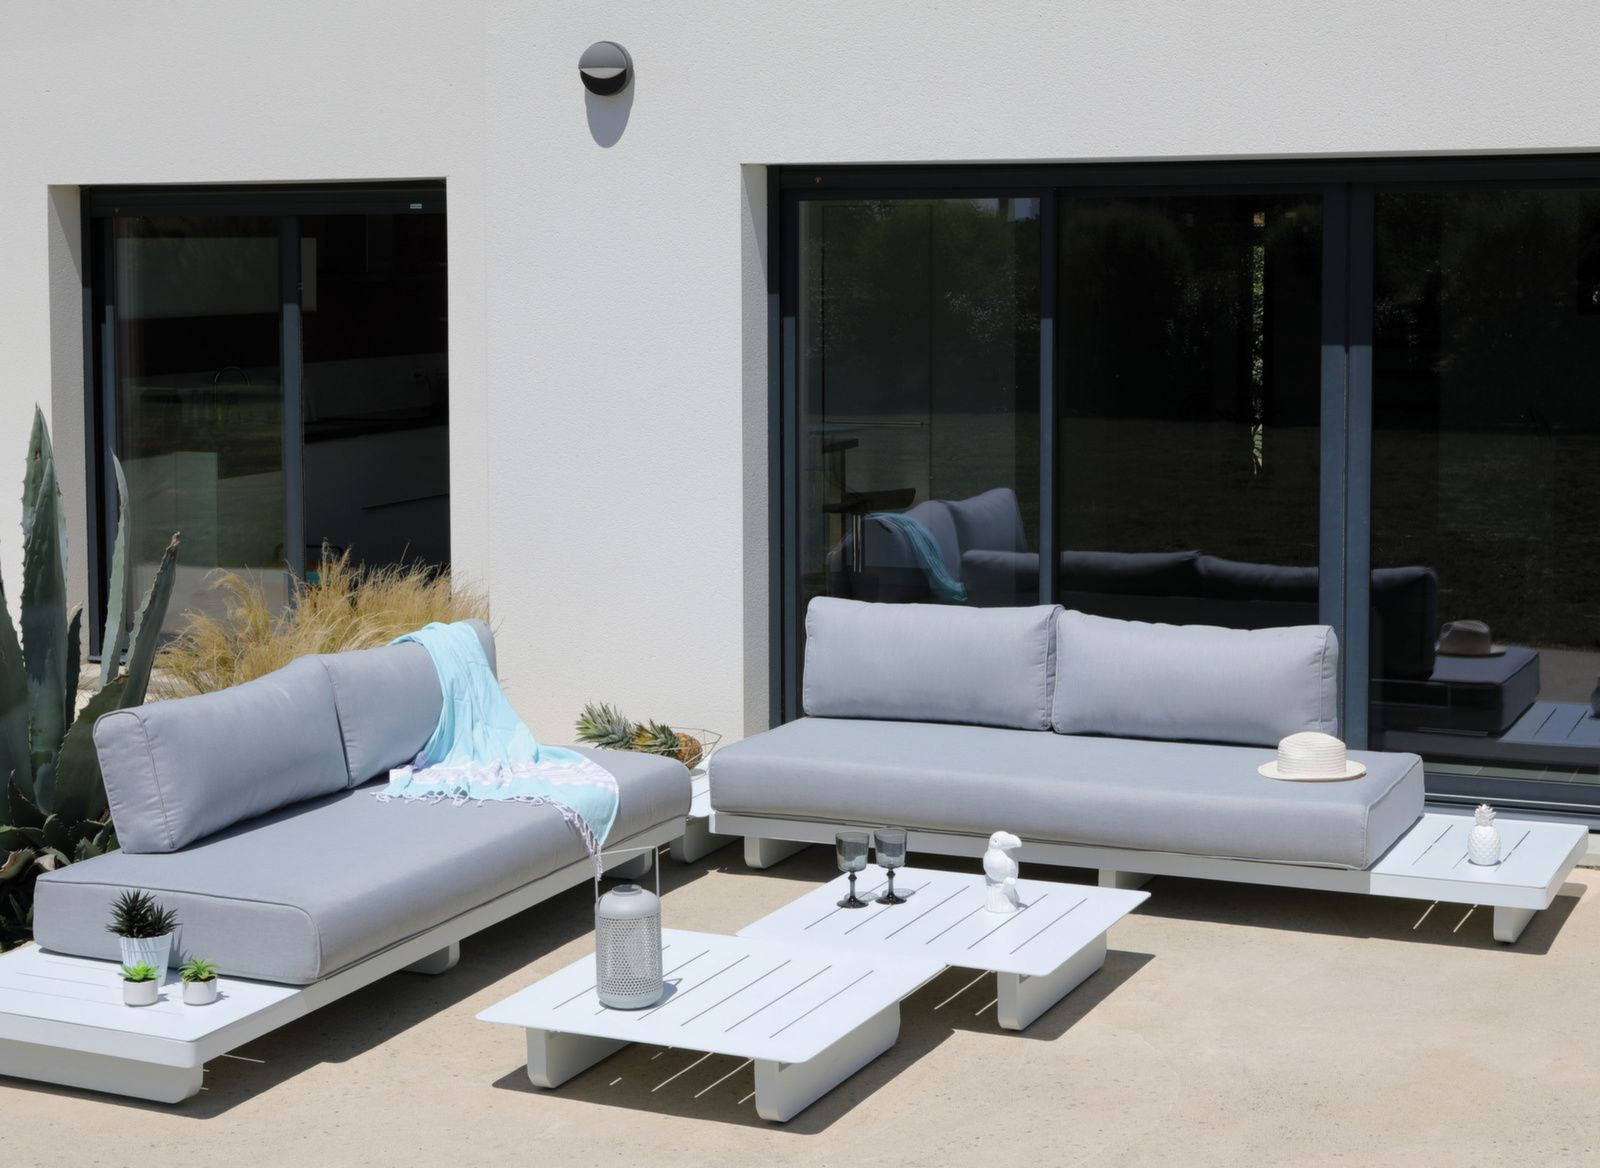 Table de Jardin en Aluminium Sur Iziva - Iziva.com